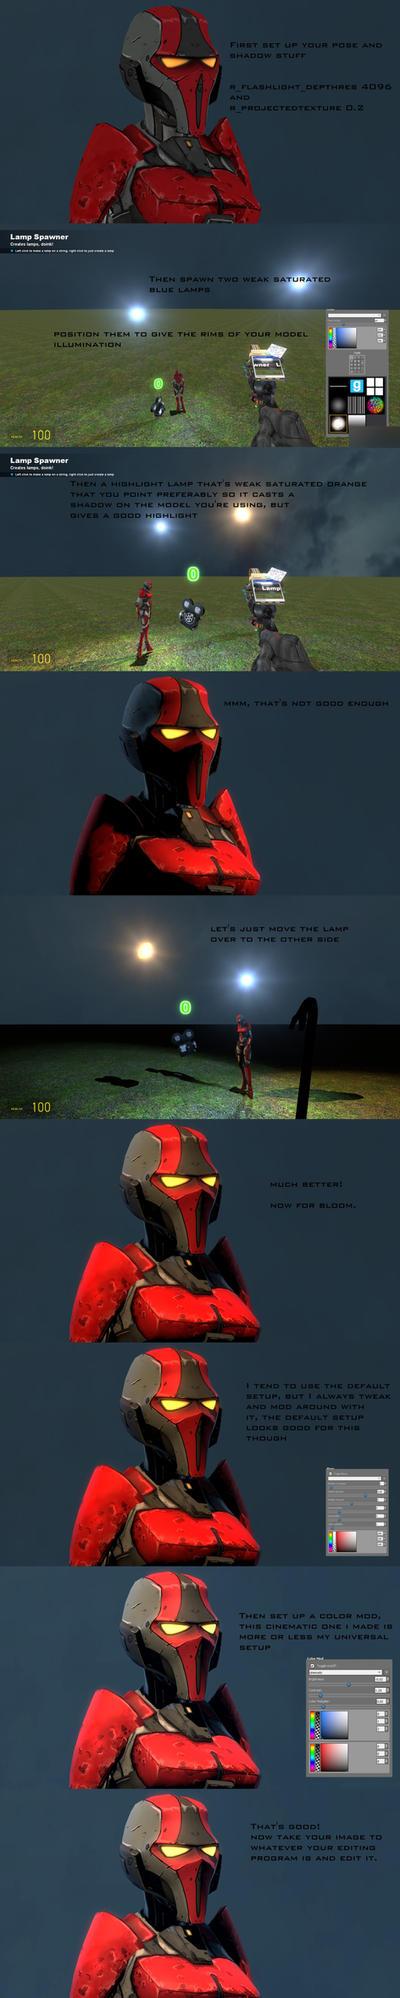 Lighting 2.0 by SuperNinjaNub